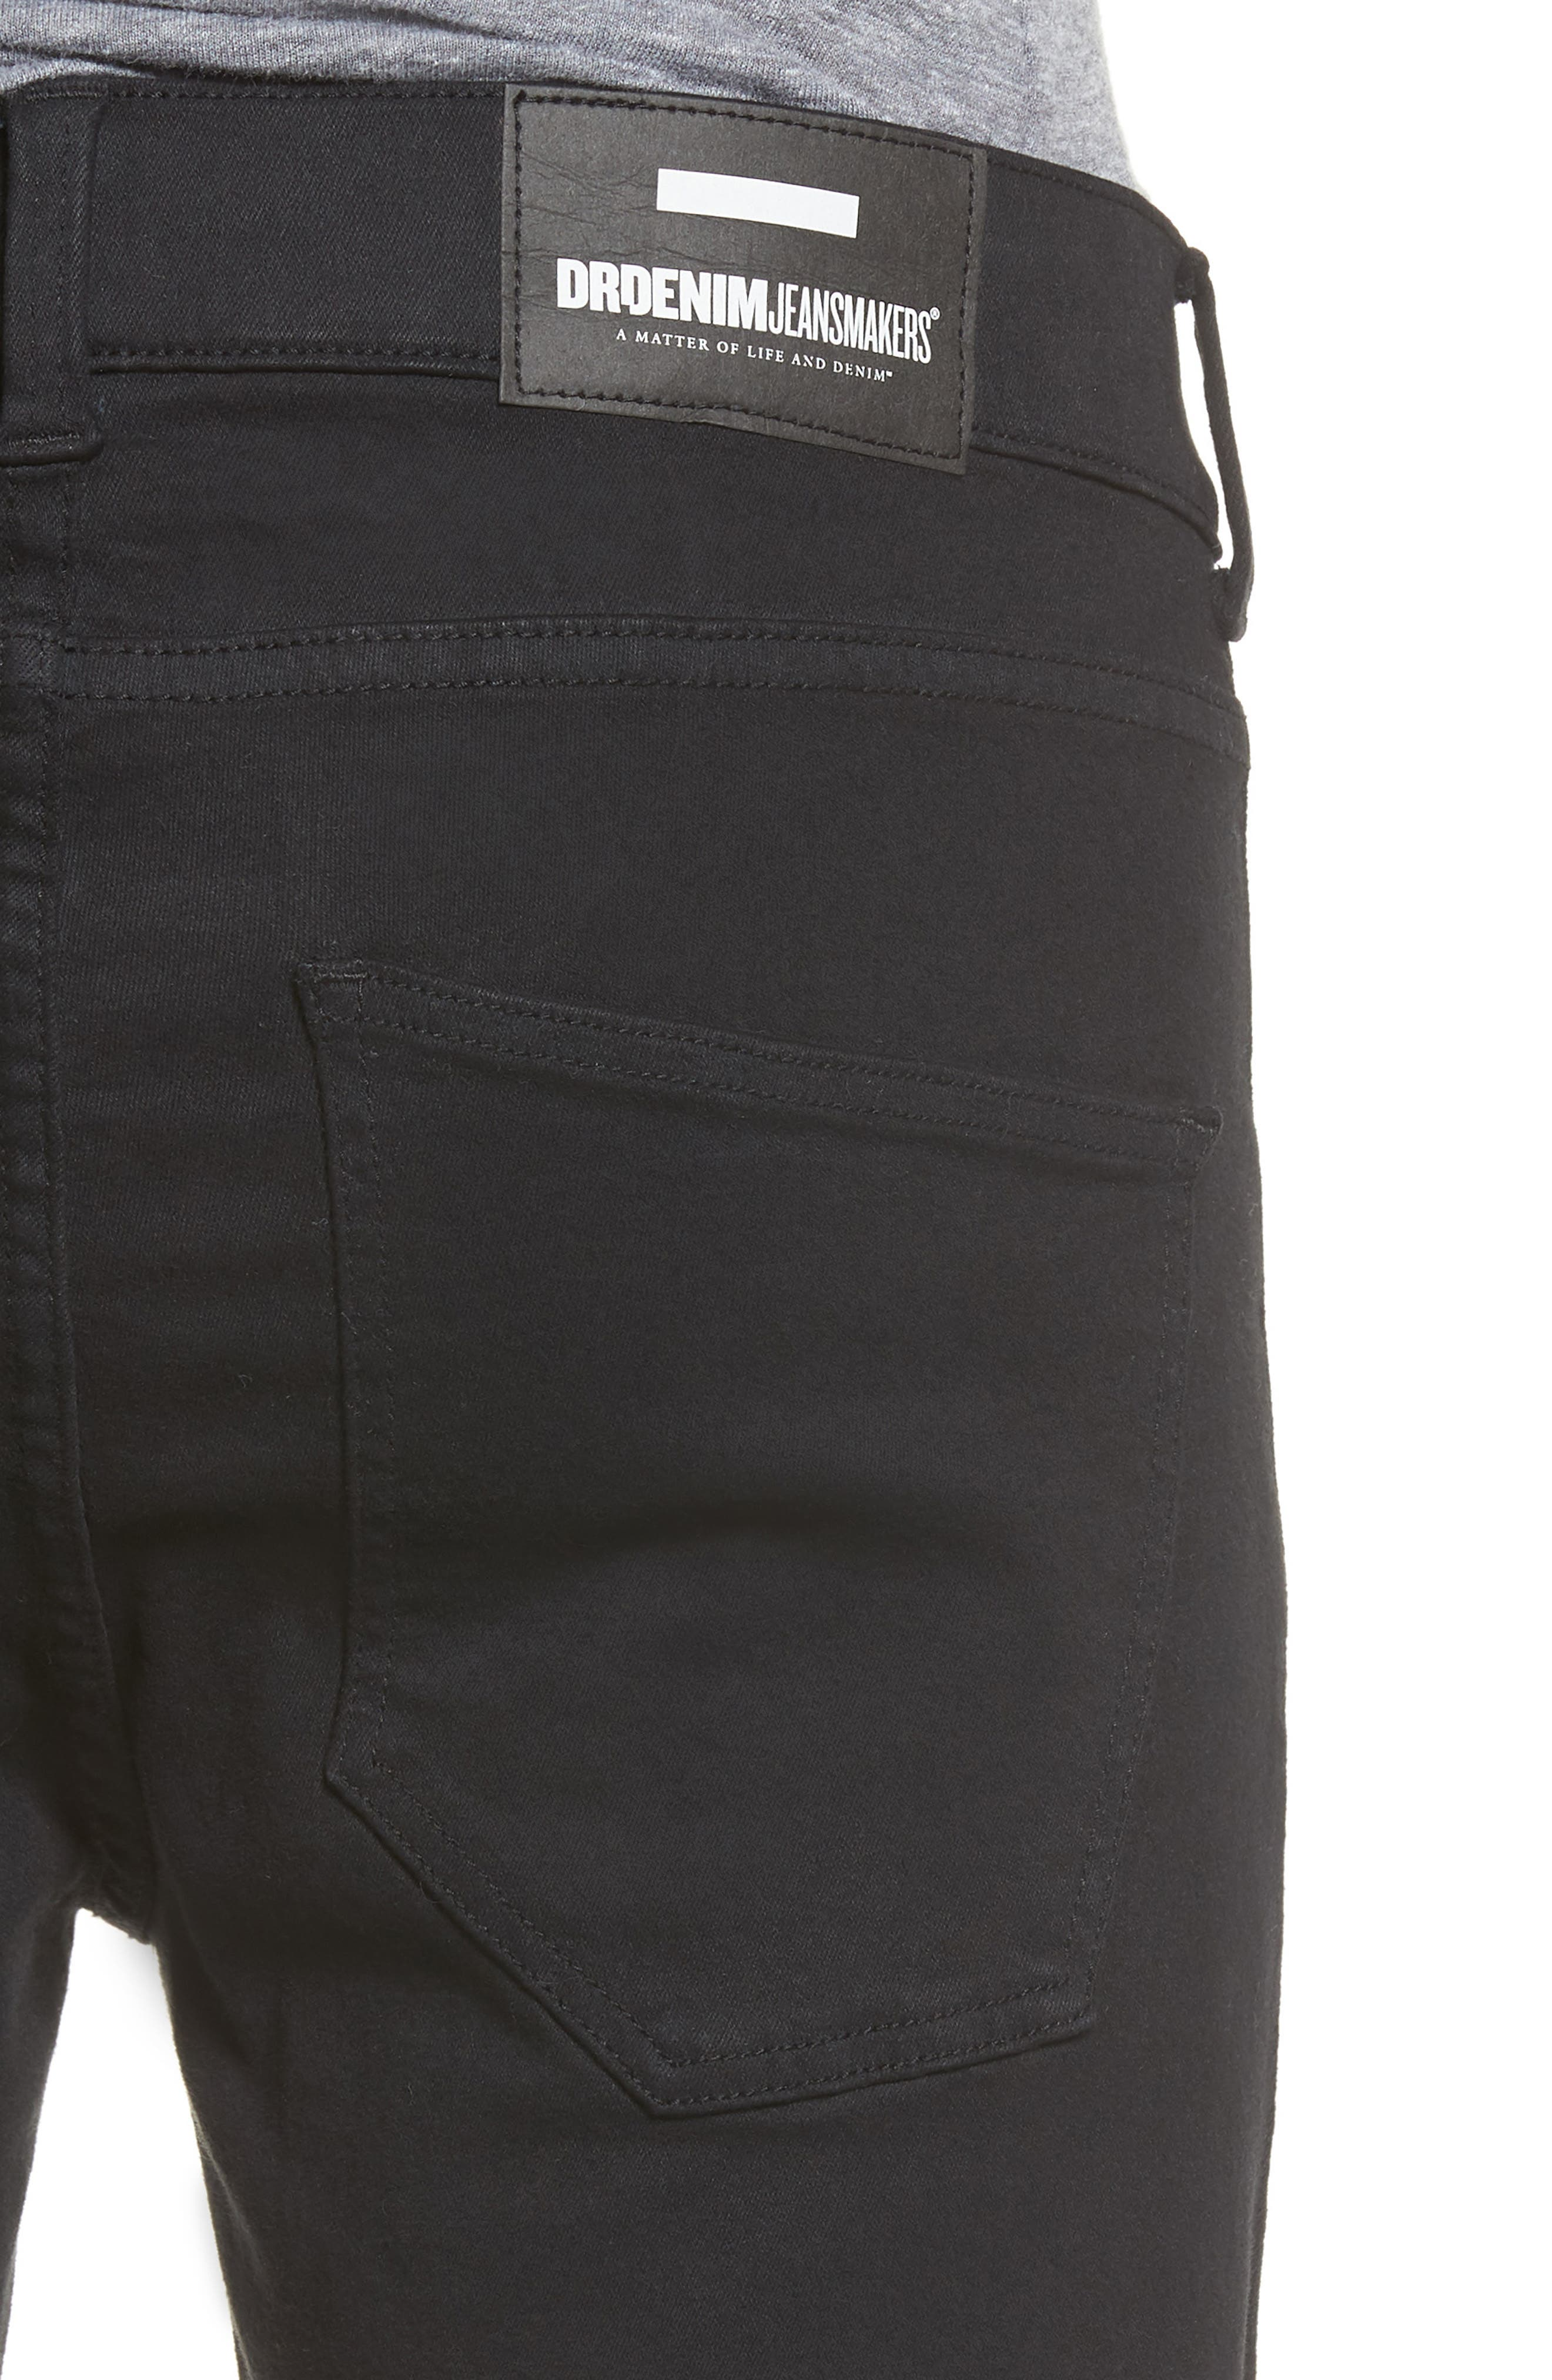 Leroy Slim Fit Jeans,                             Alternate thumbnail 4, color,                             Black Ripped Knees